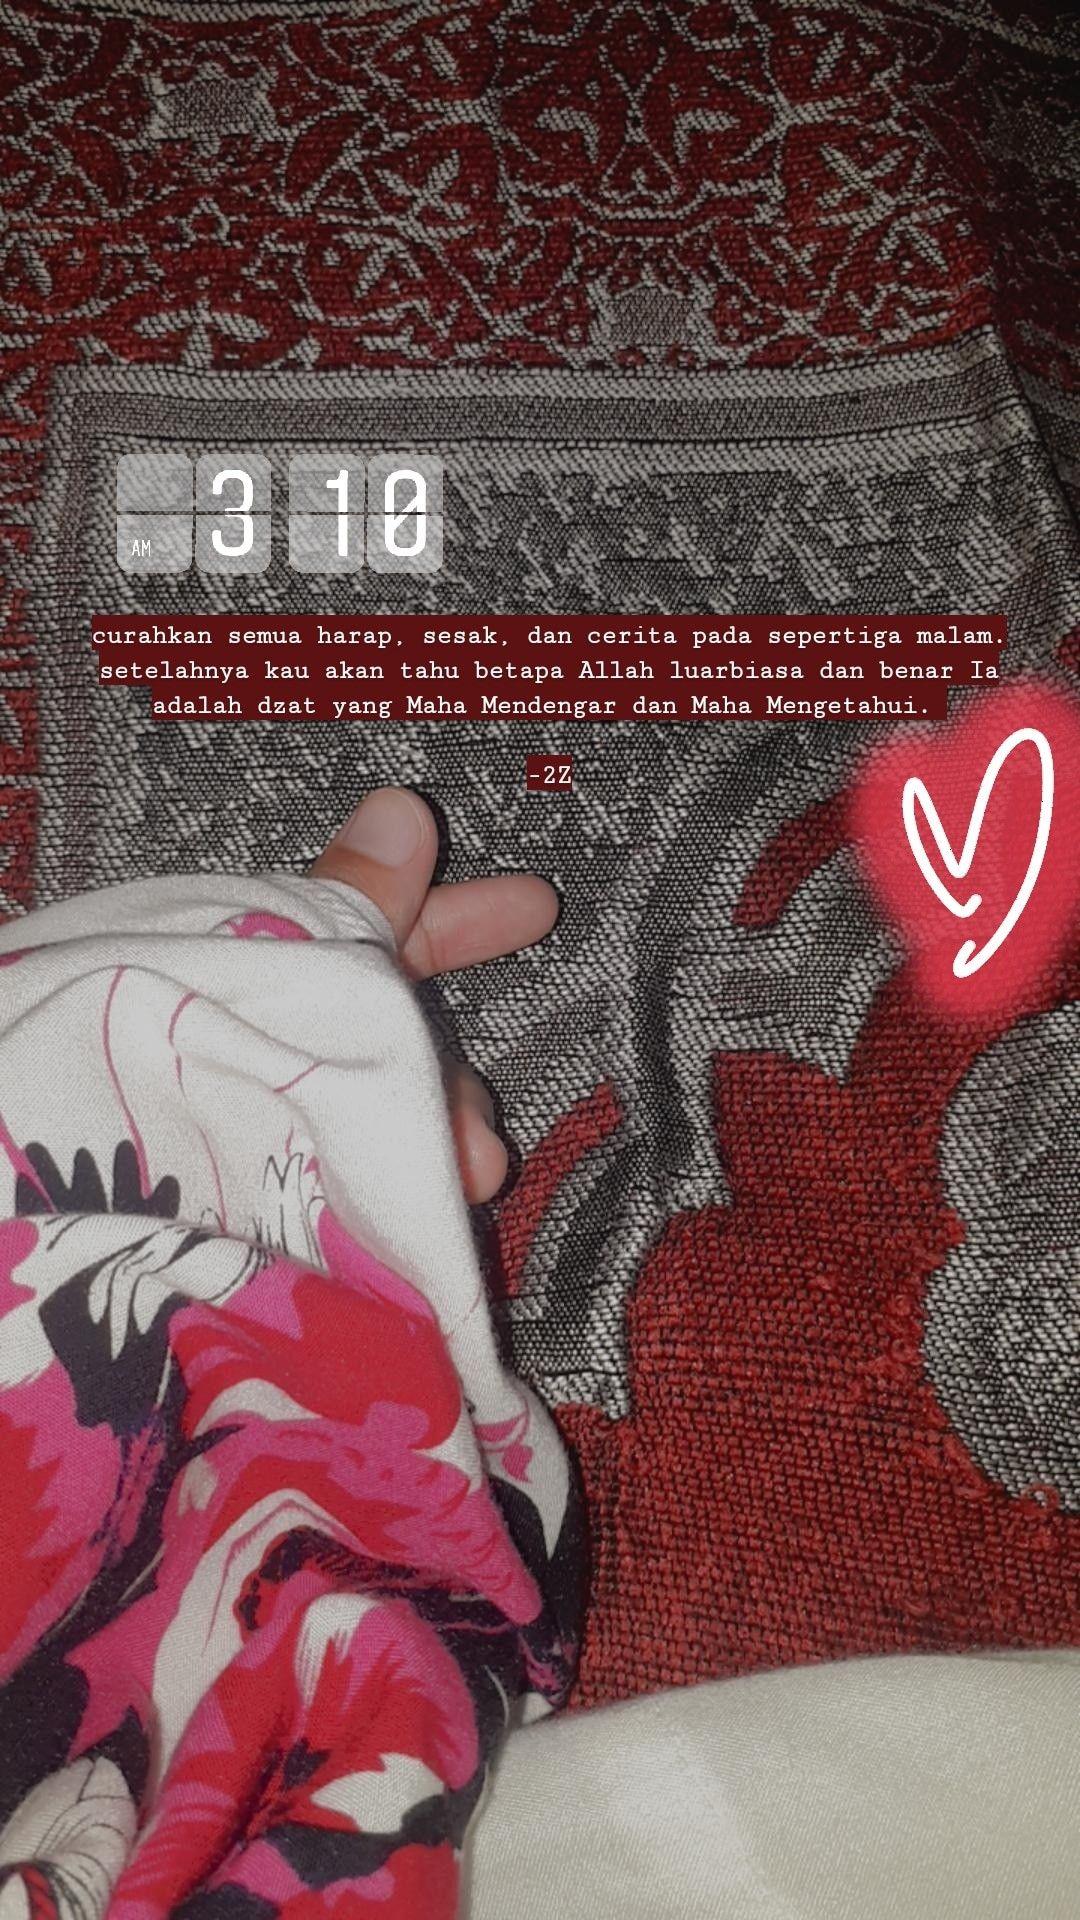 Pin Oleh Wahyu Purnomo Di Z Di 2020 Kekuatan Doa Kutipan Pelajaran Hidup Teks Romantis